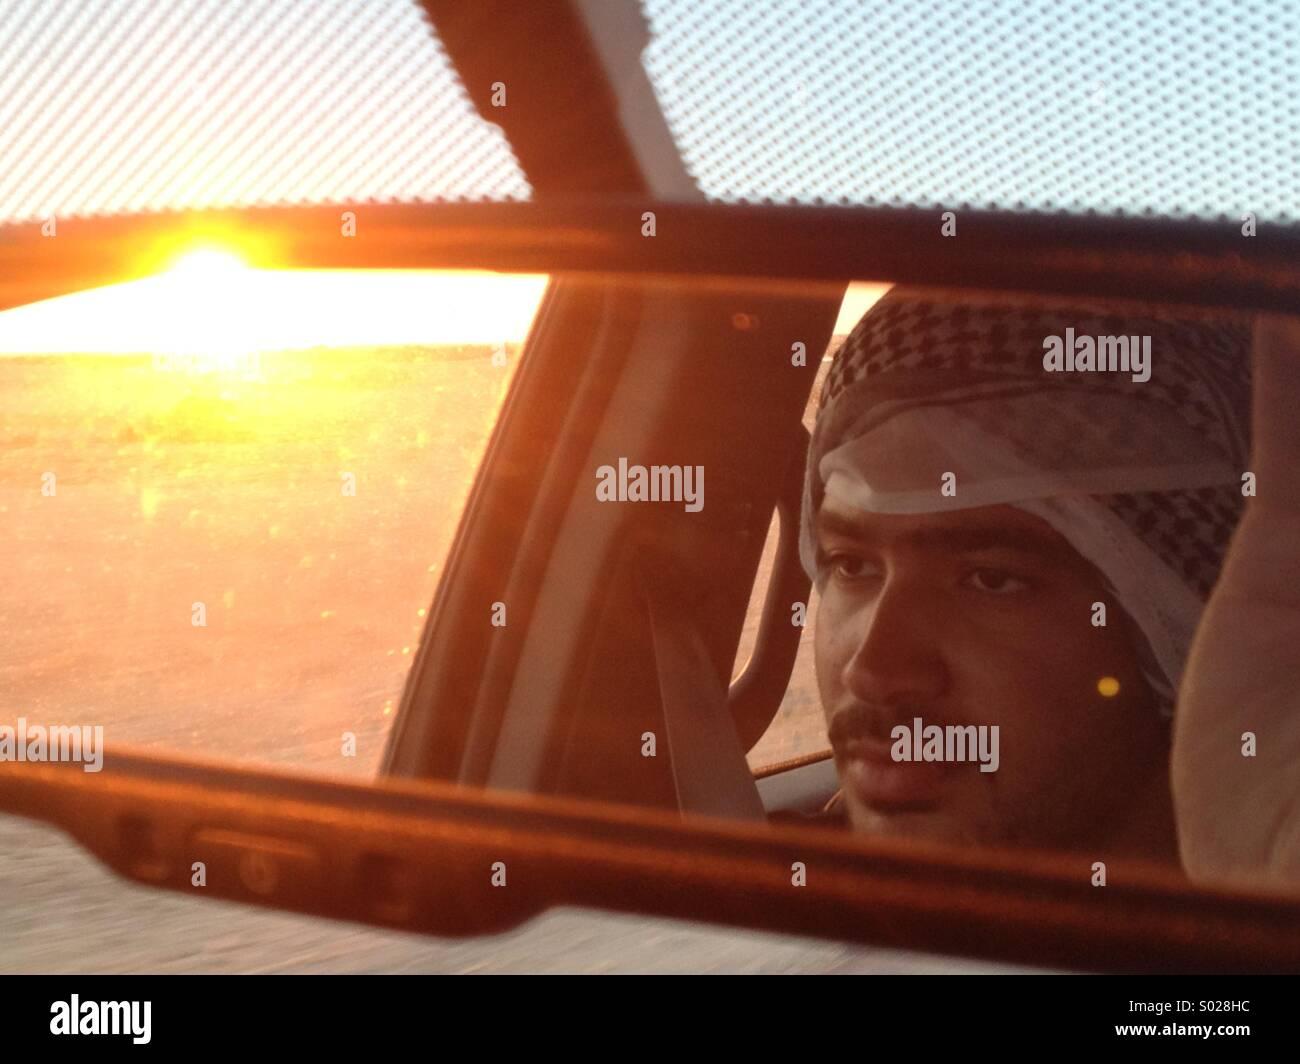 Egyptian man driving at sunset - Stock Image